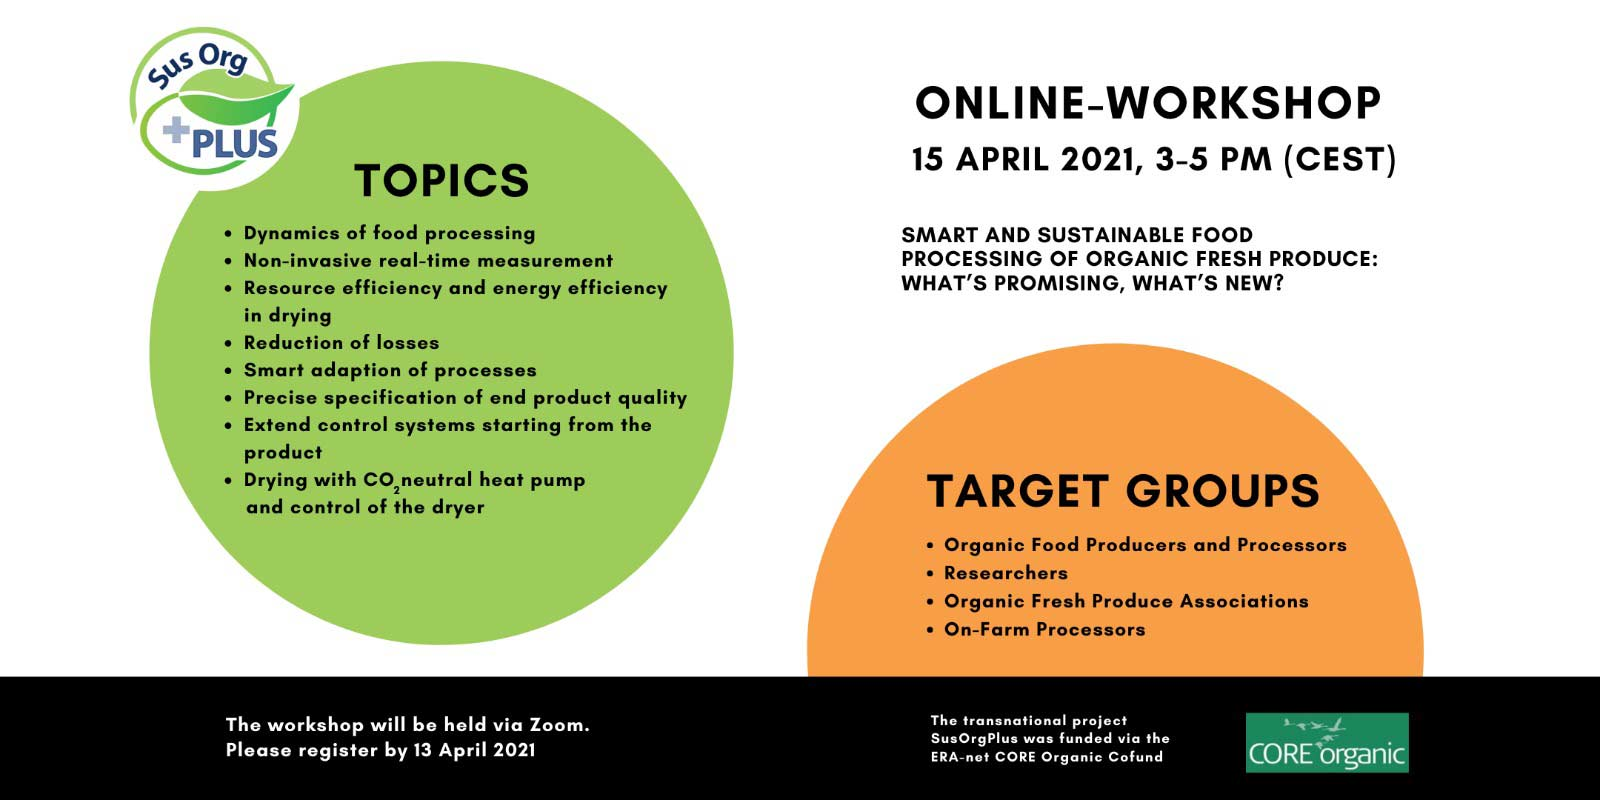 SusOrgPlus Online Workshop 15 Aprilie 2021